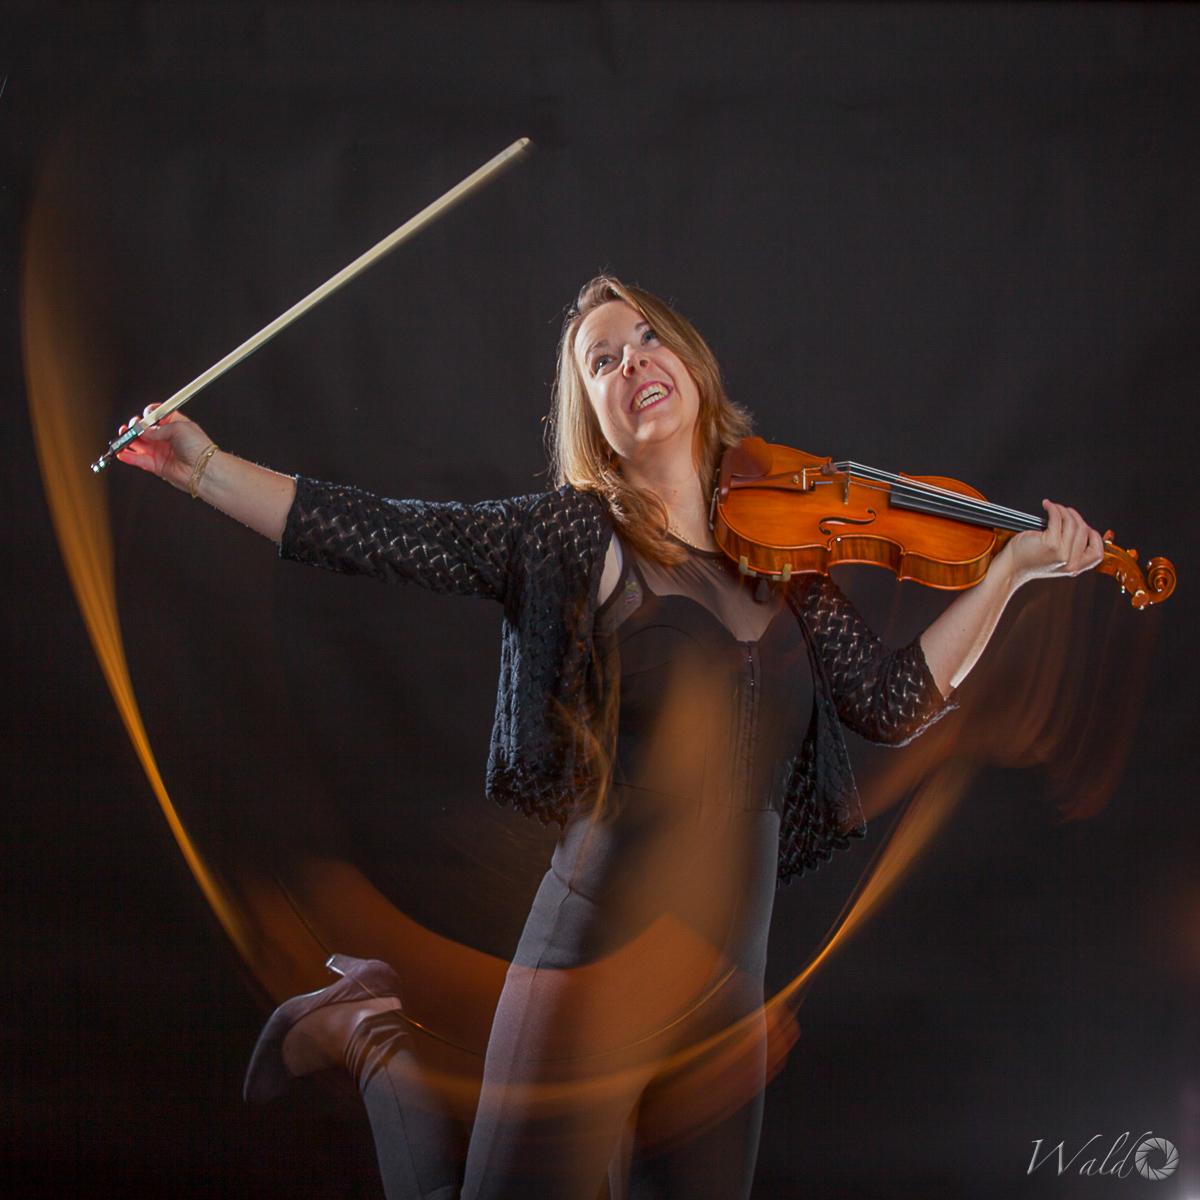 Inge Bergenhuizen, Violin